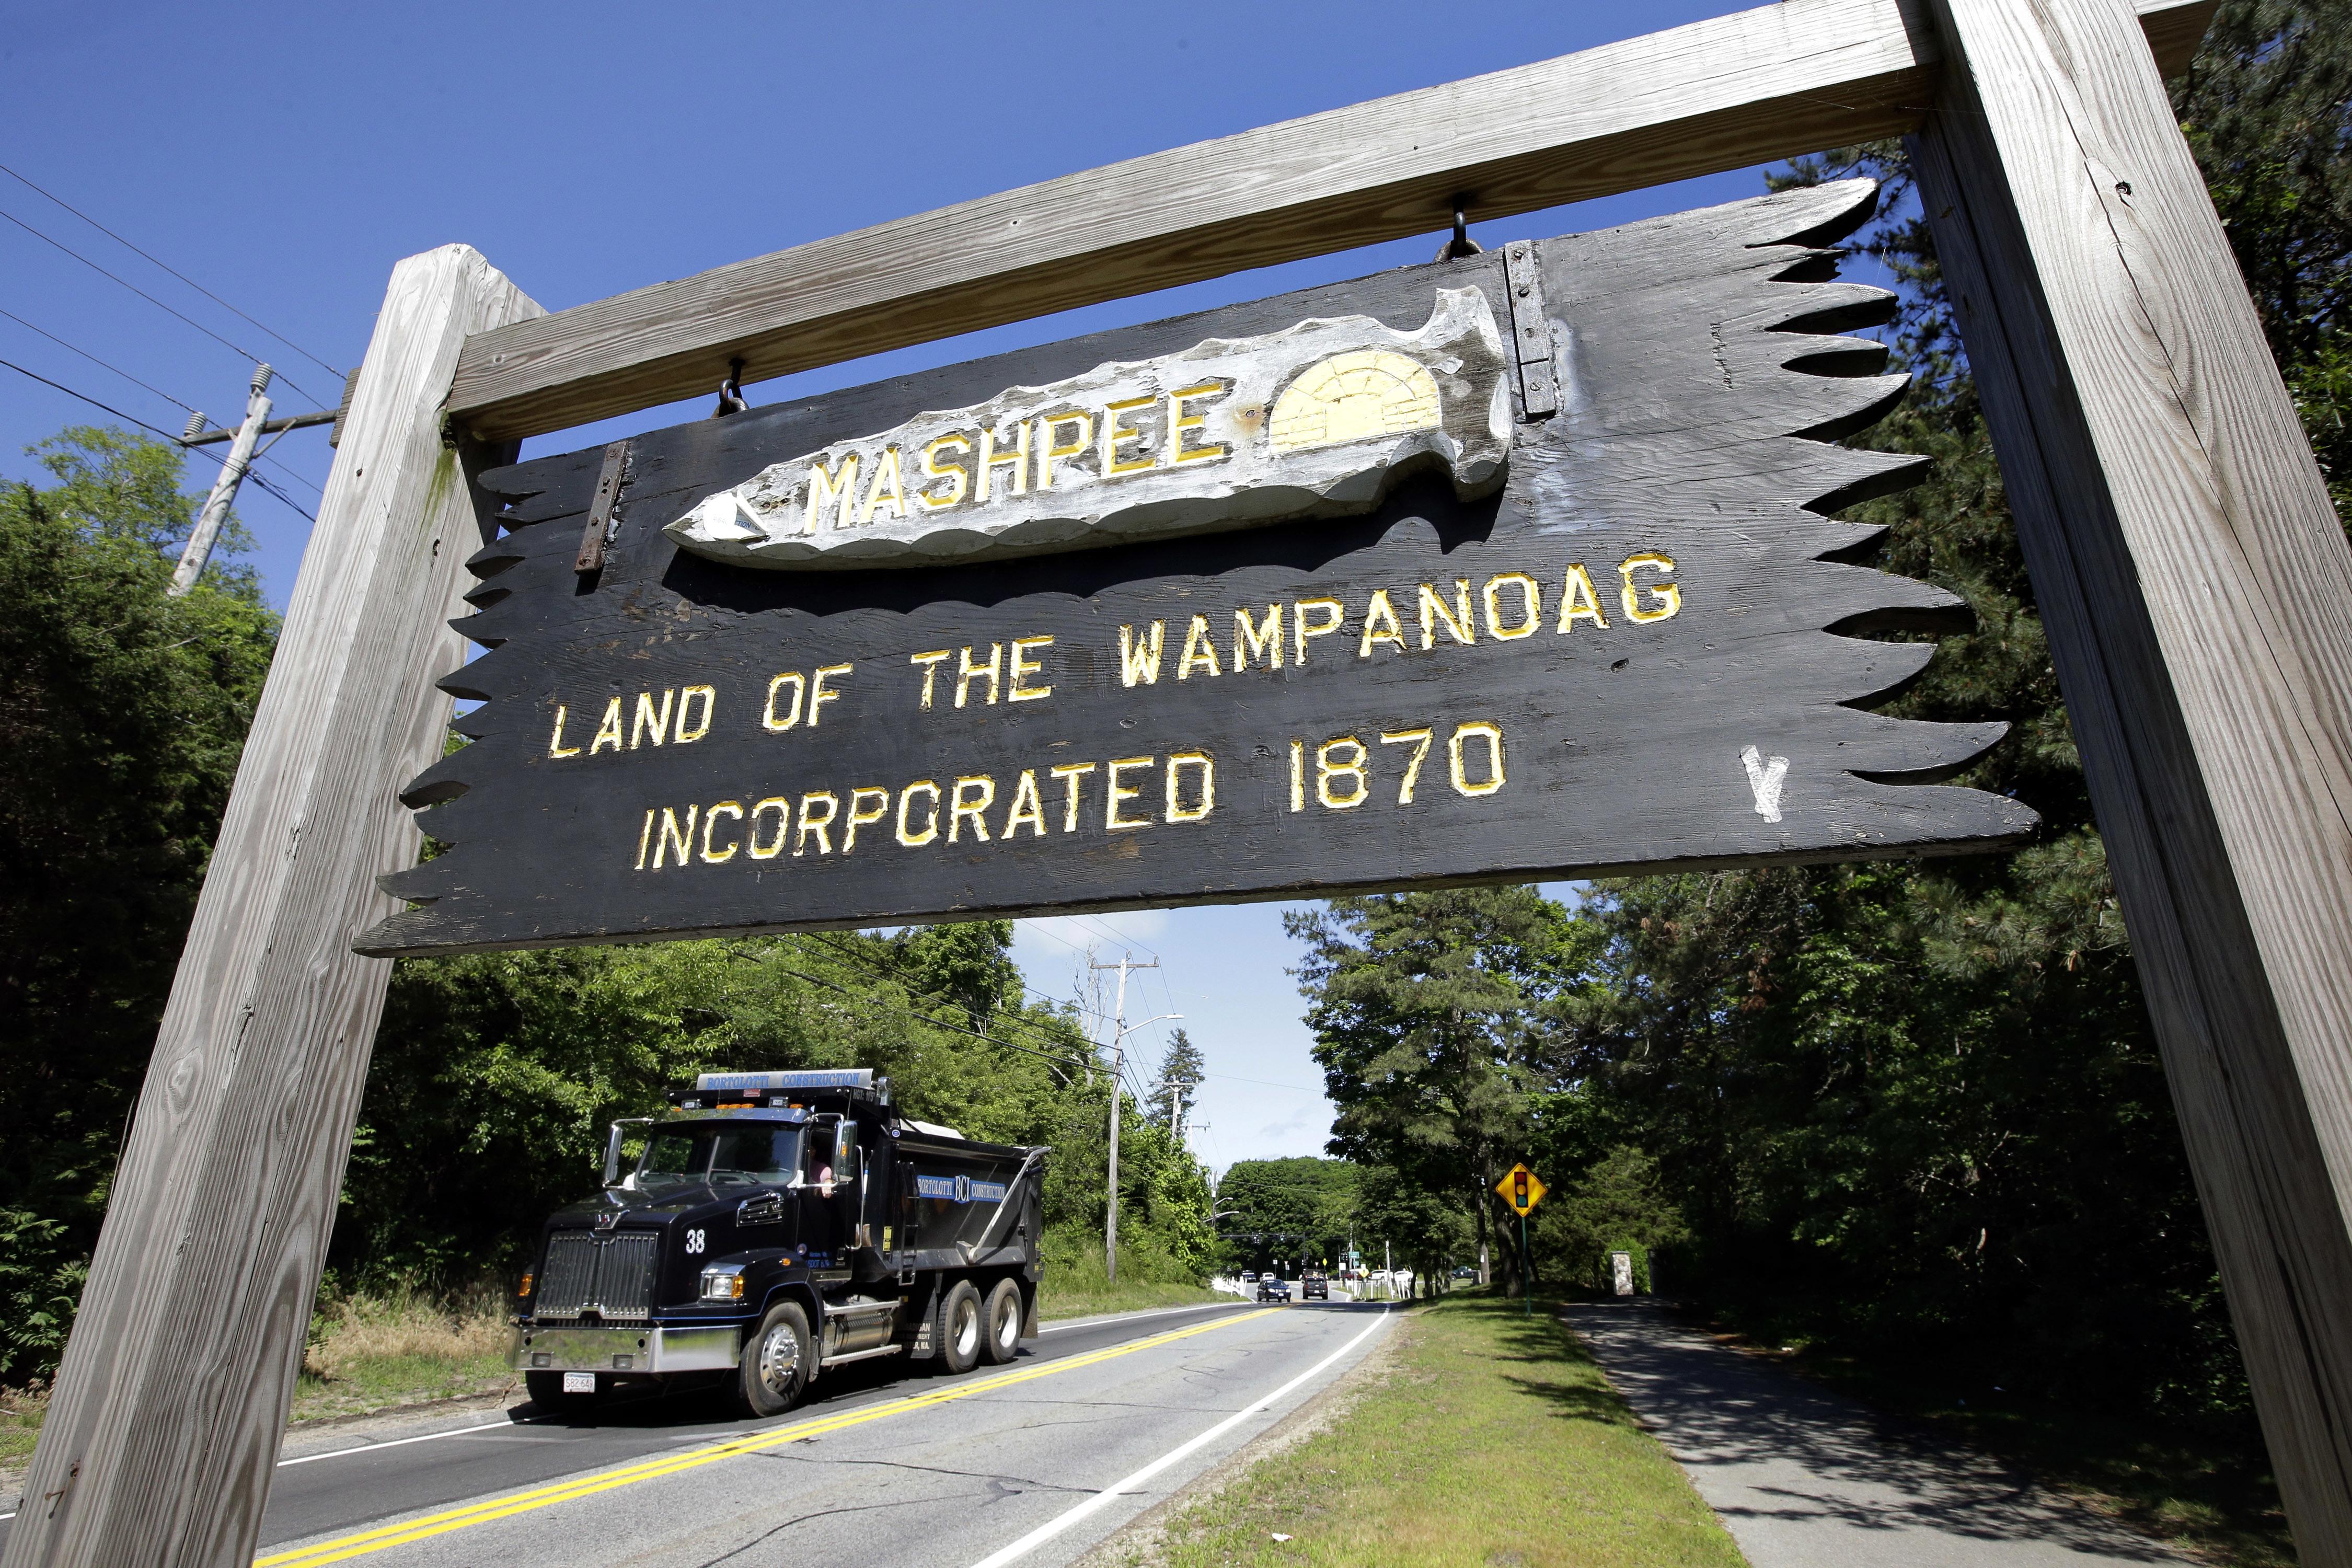 A sign marking the location of Mashpee Wampanoag land.